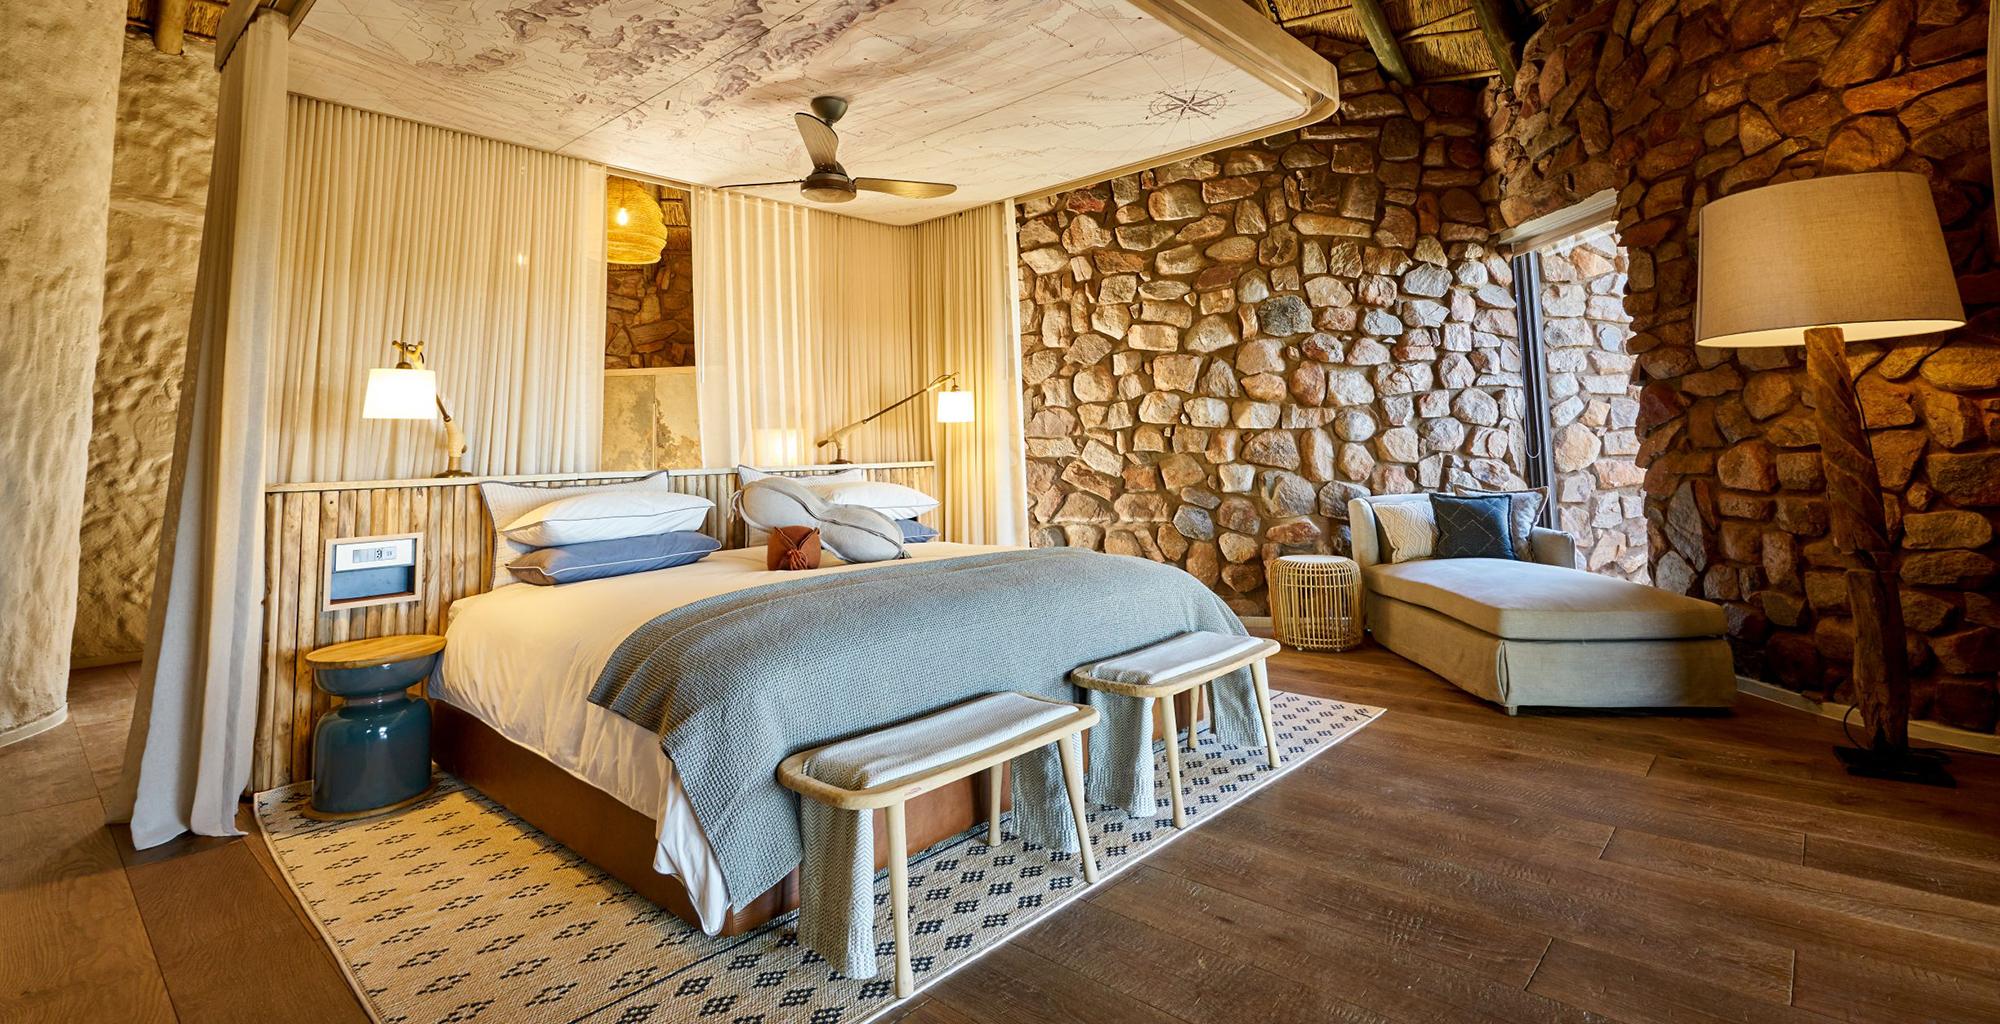 South-Africa-Motse-Lodge-Bedroom